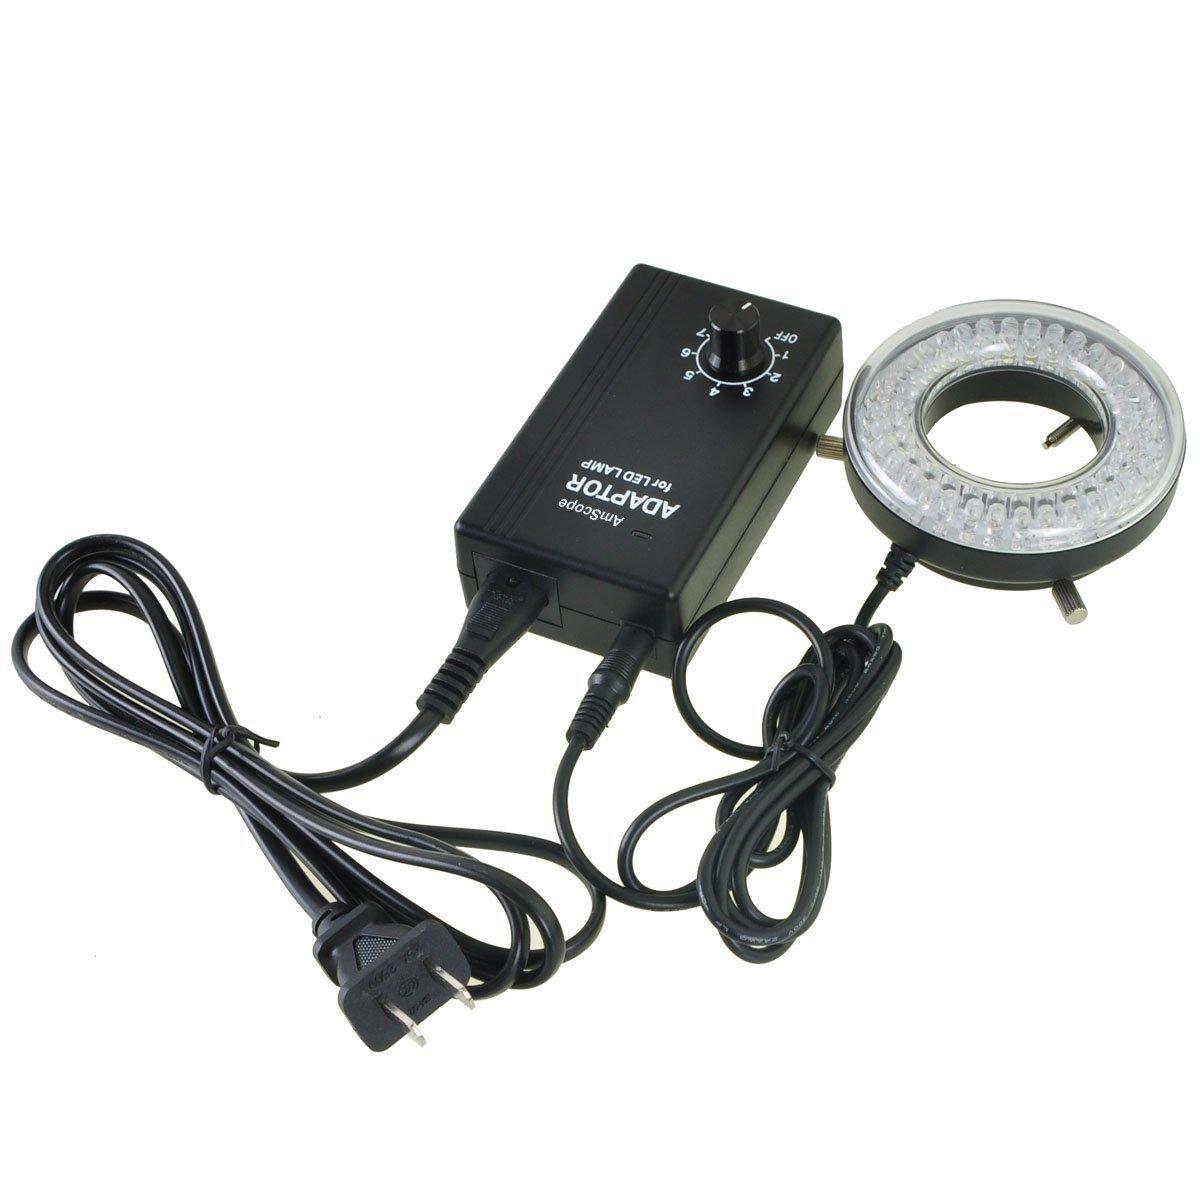 AmScope Lampe LED anneau 64 LED pour Microscope avec adaptateur